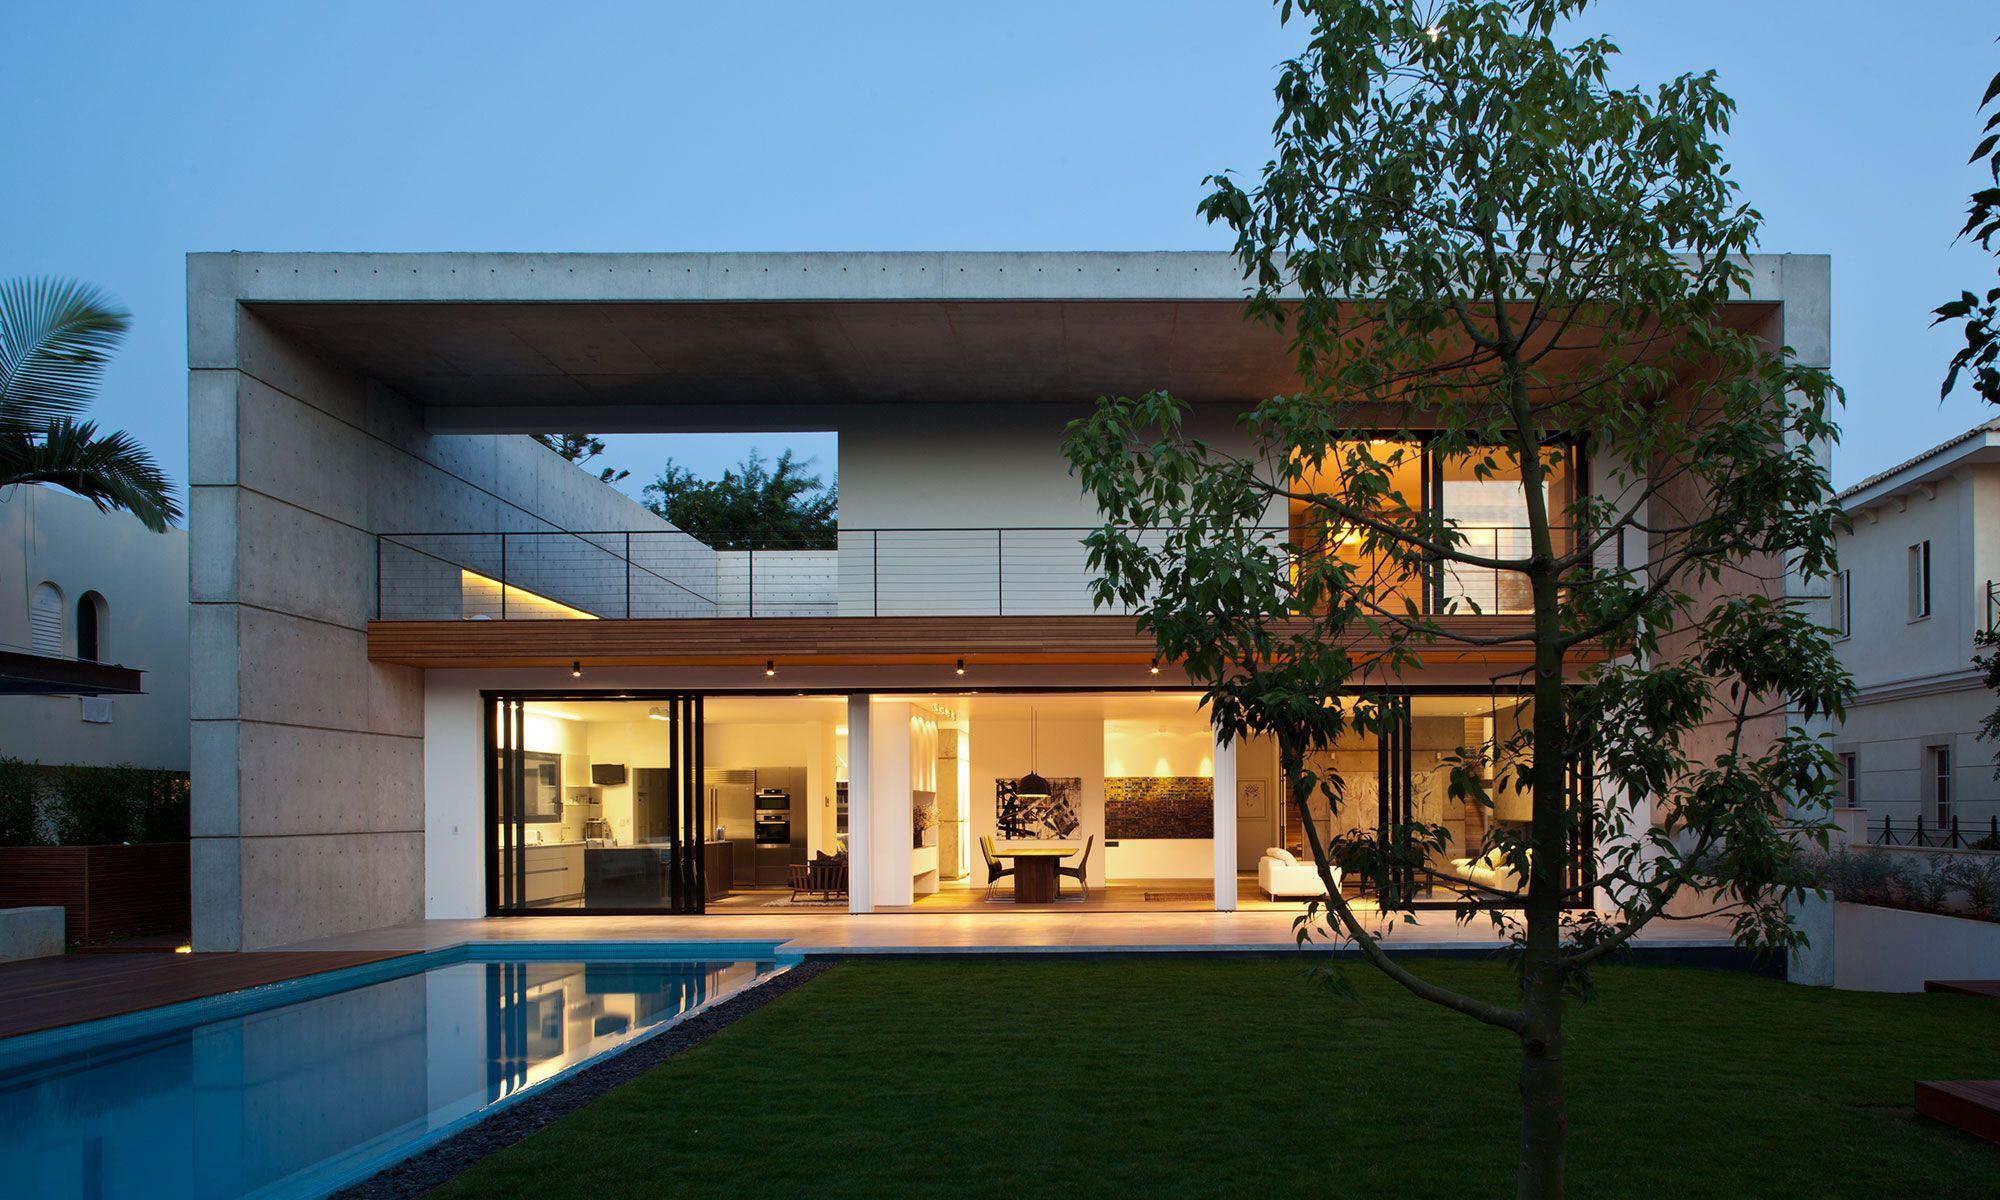 Ramat Hasharon House 6 - Pitsou Kedem